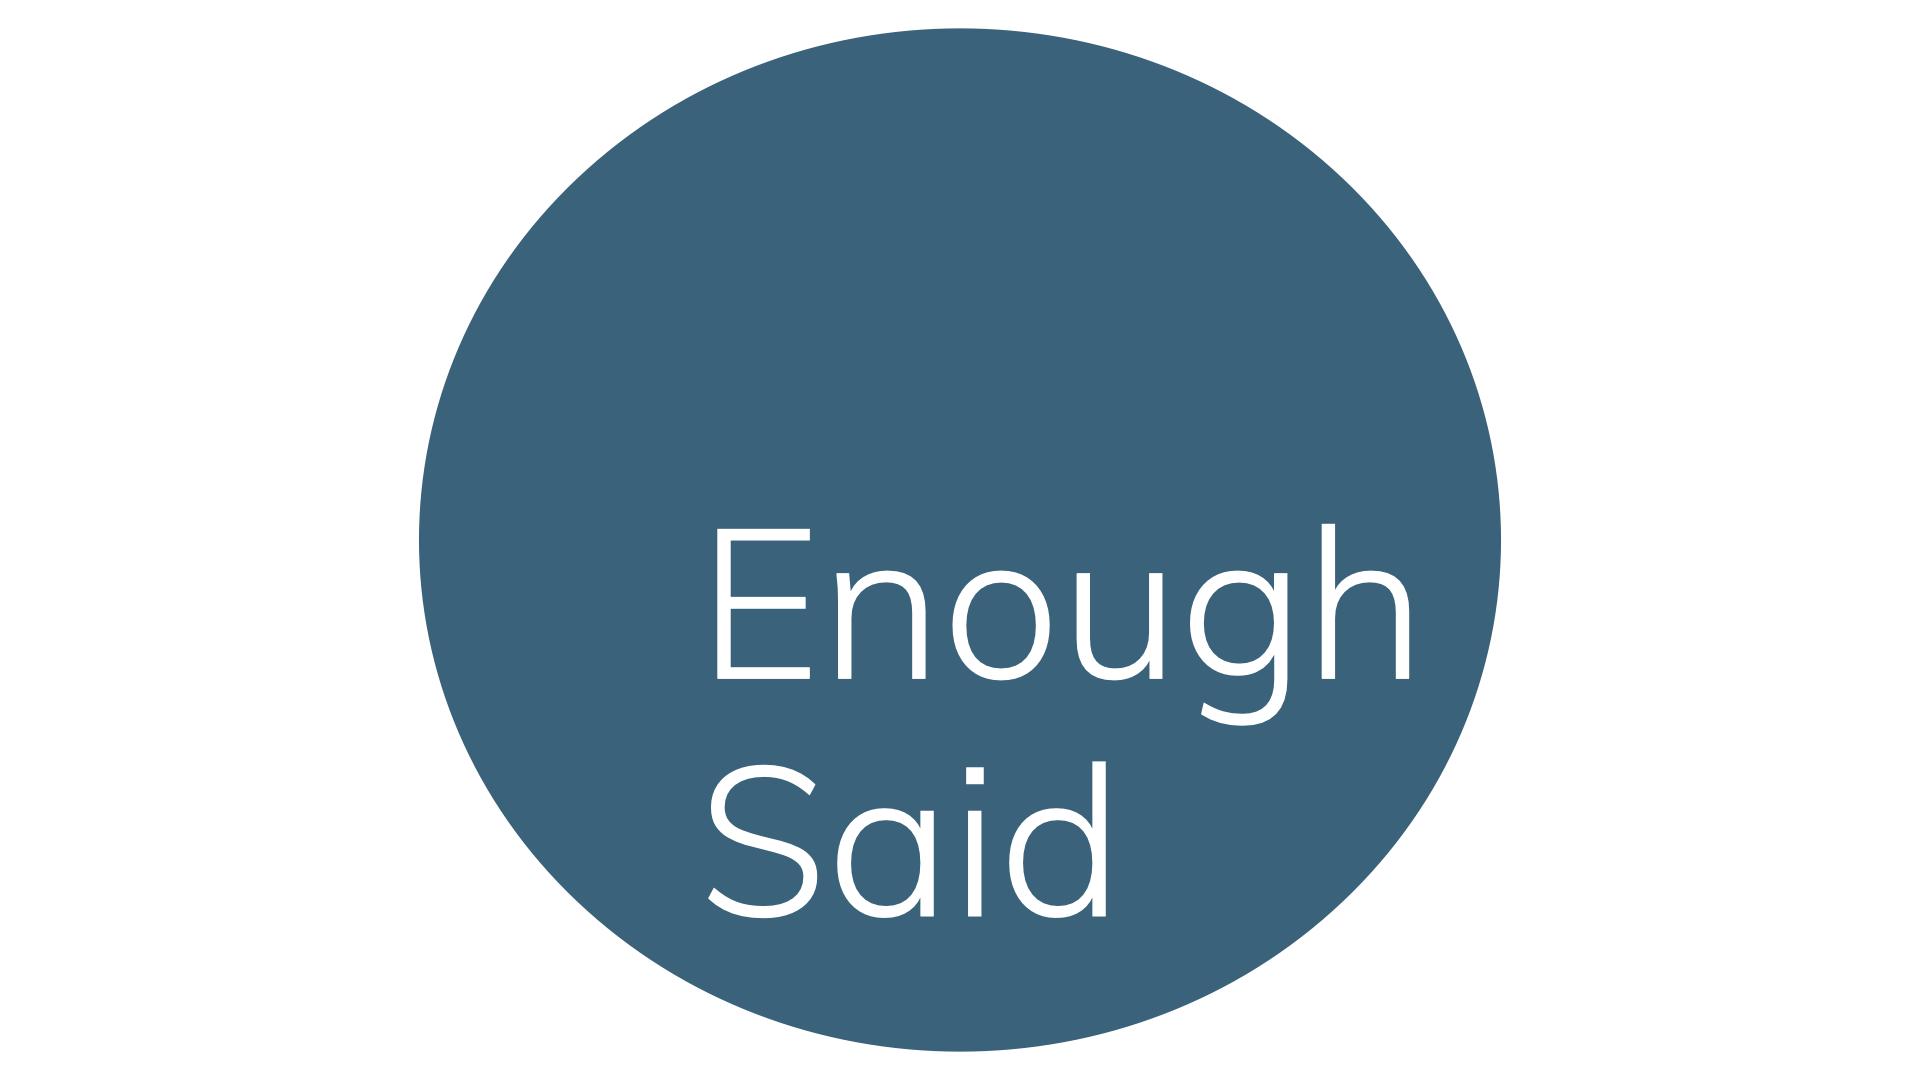 Enough Said tone of voice consultancy